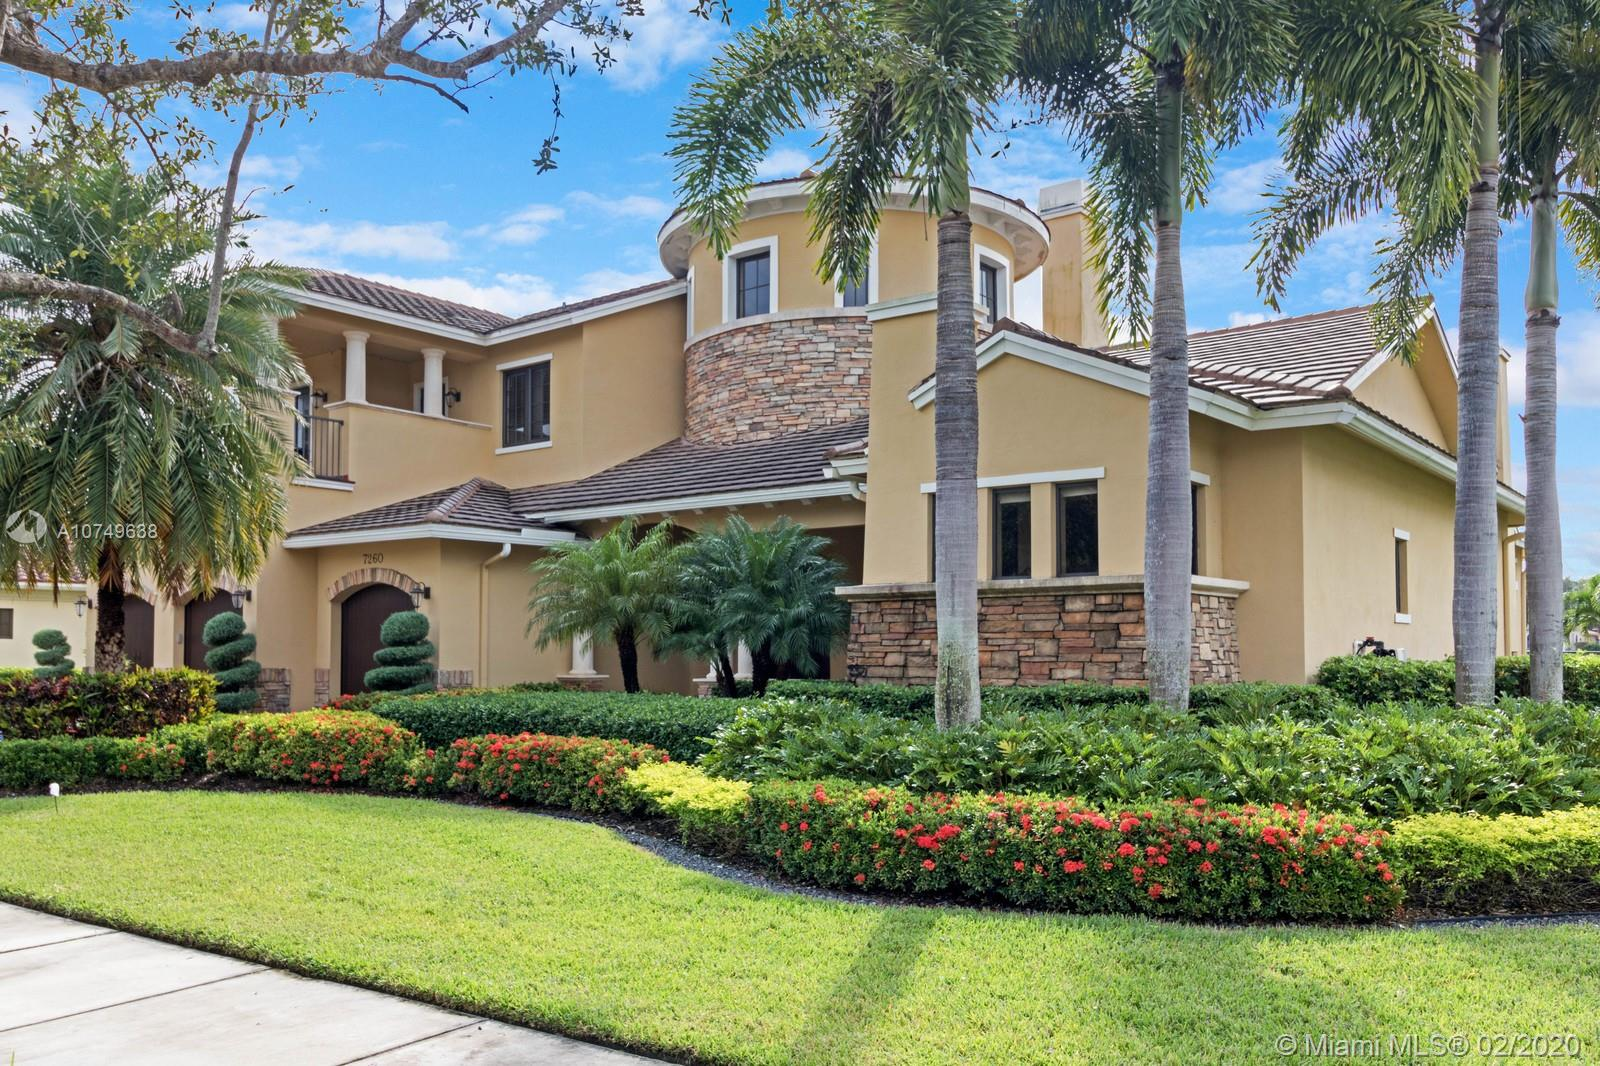 Property for sale at 7260 Lemon Grass Dr, Parkland,  Florida 33076